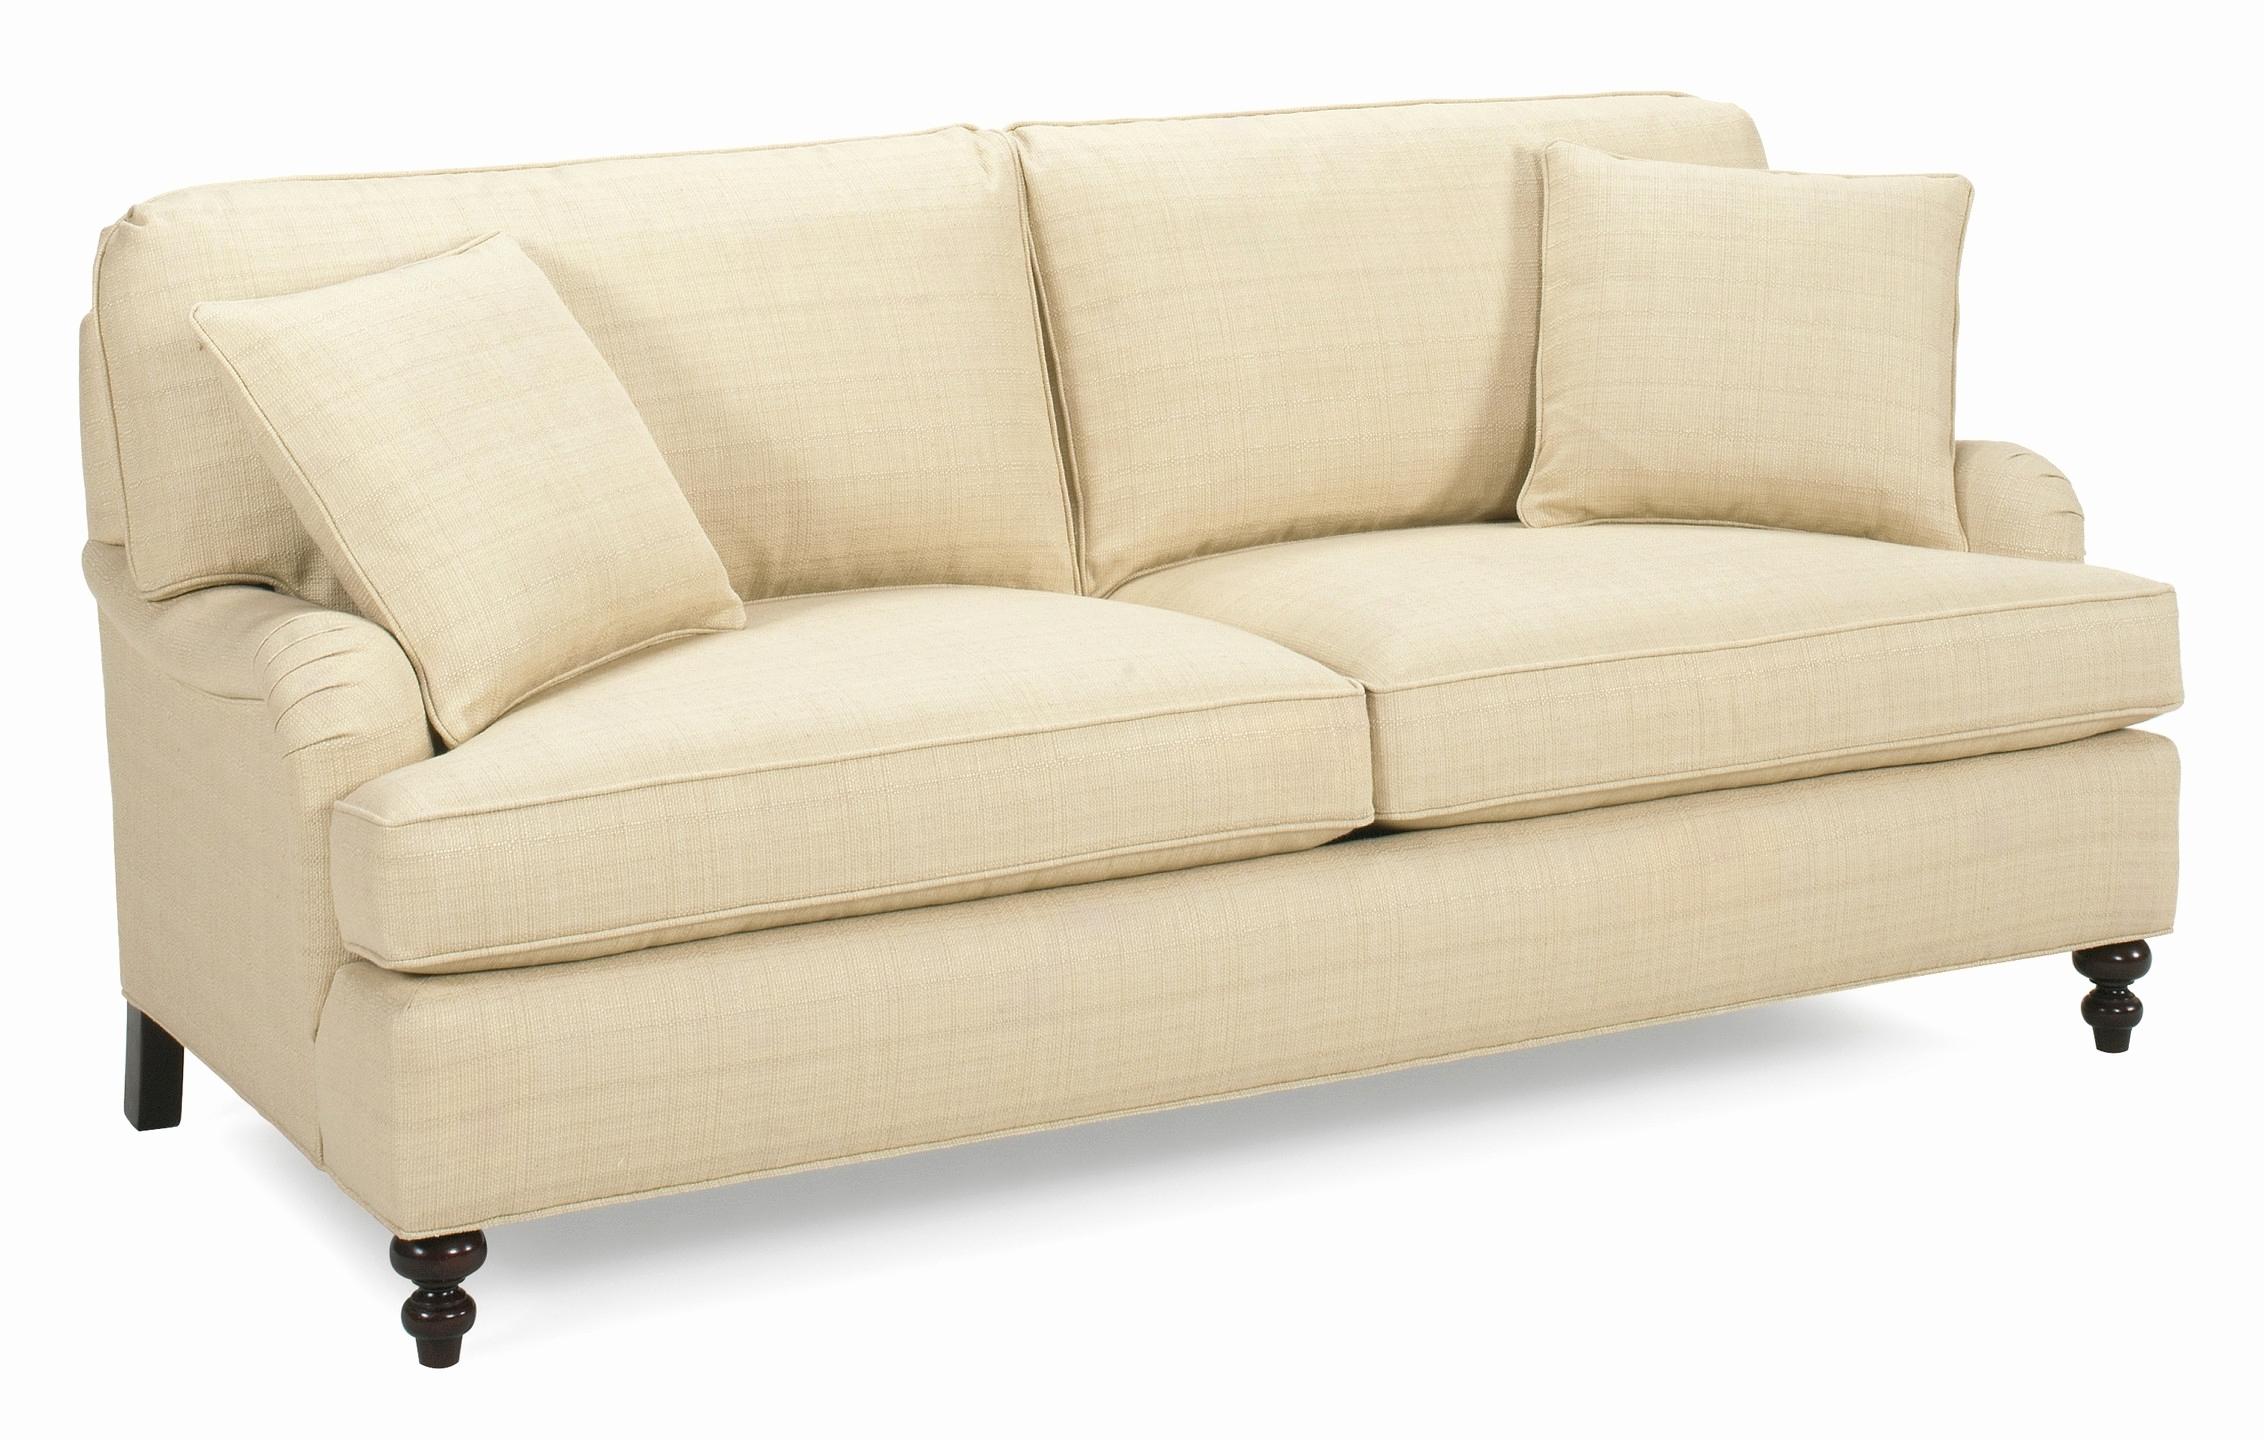 2017 Chintz Sofas For Chintz Armchair Elegant Arm Chair English Style Sofas Sale High (View 9 of 15)